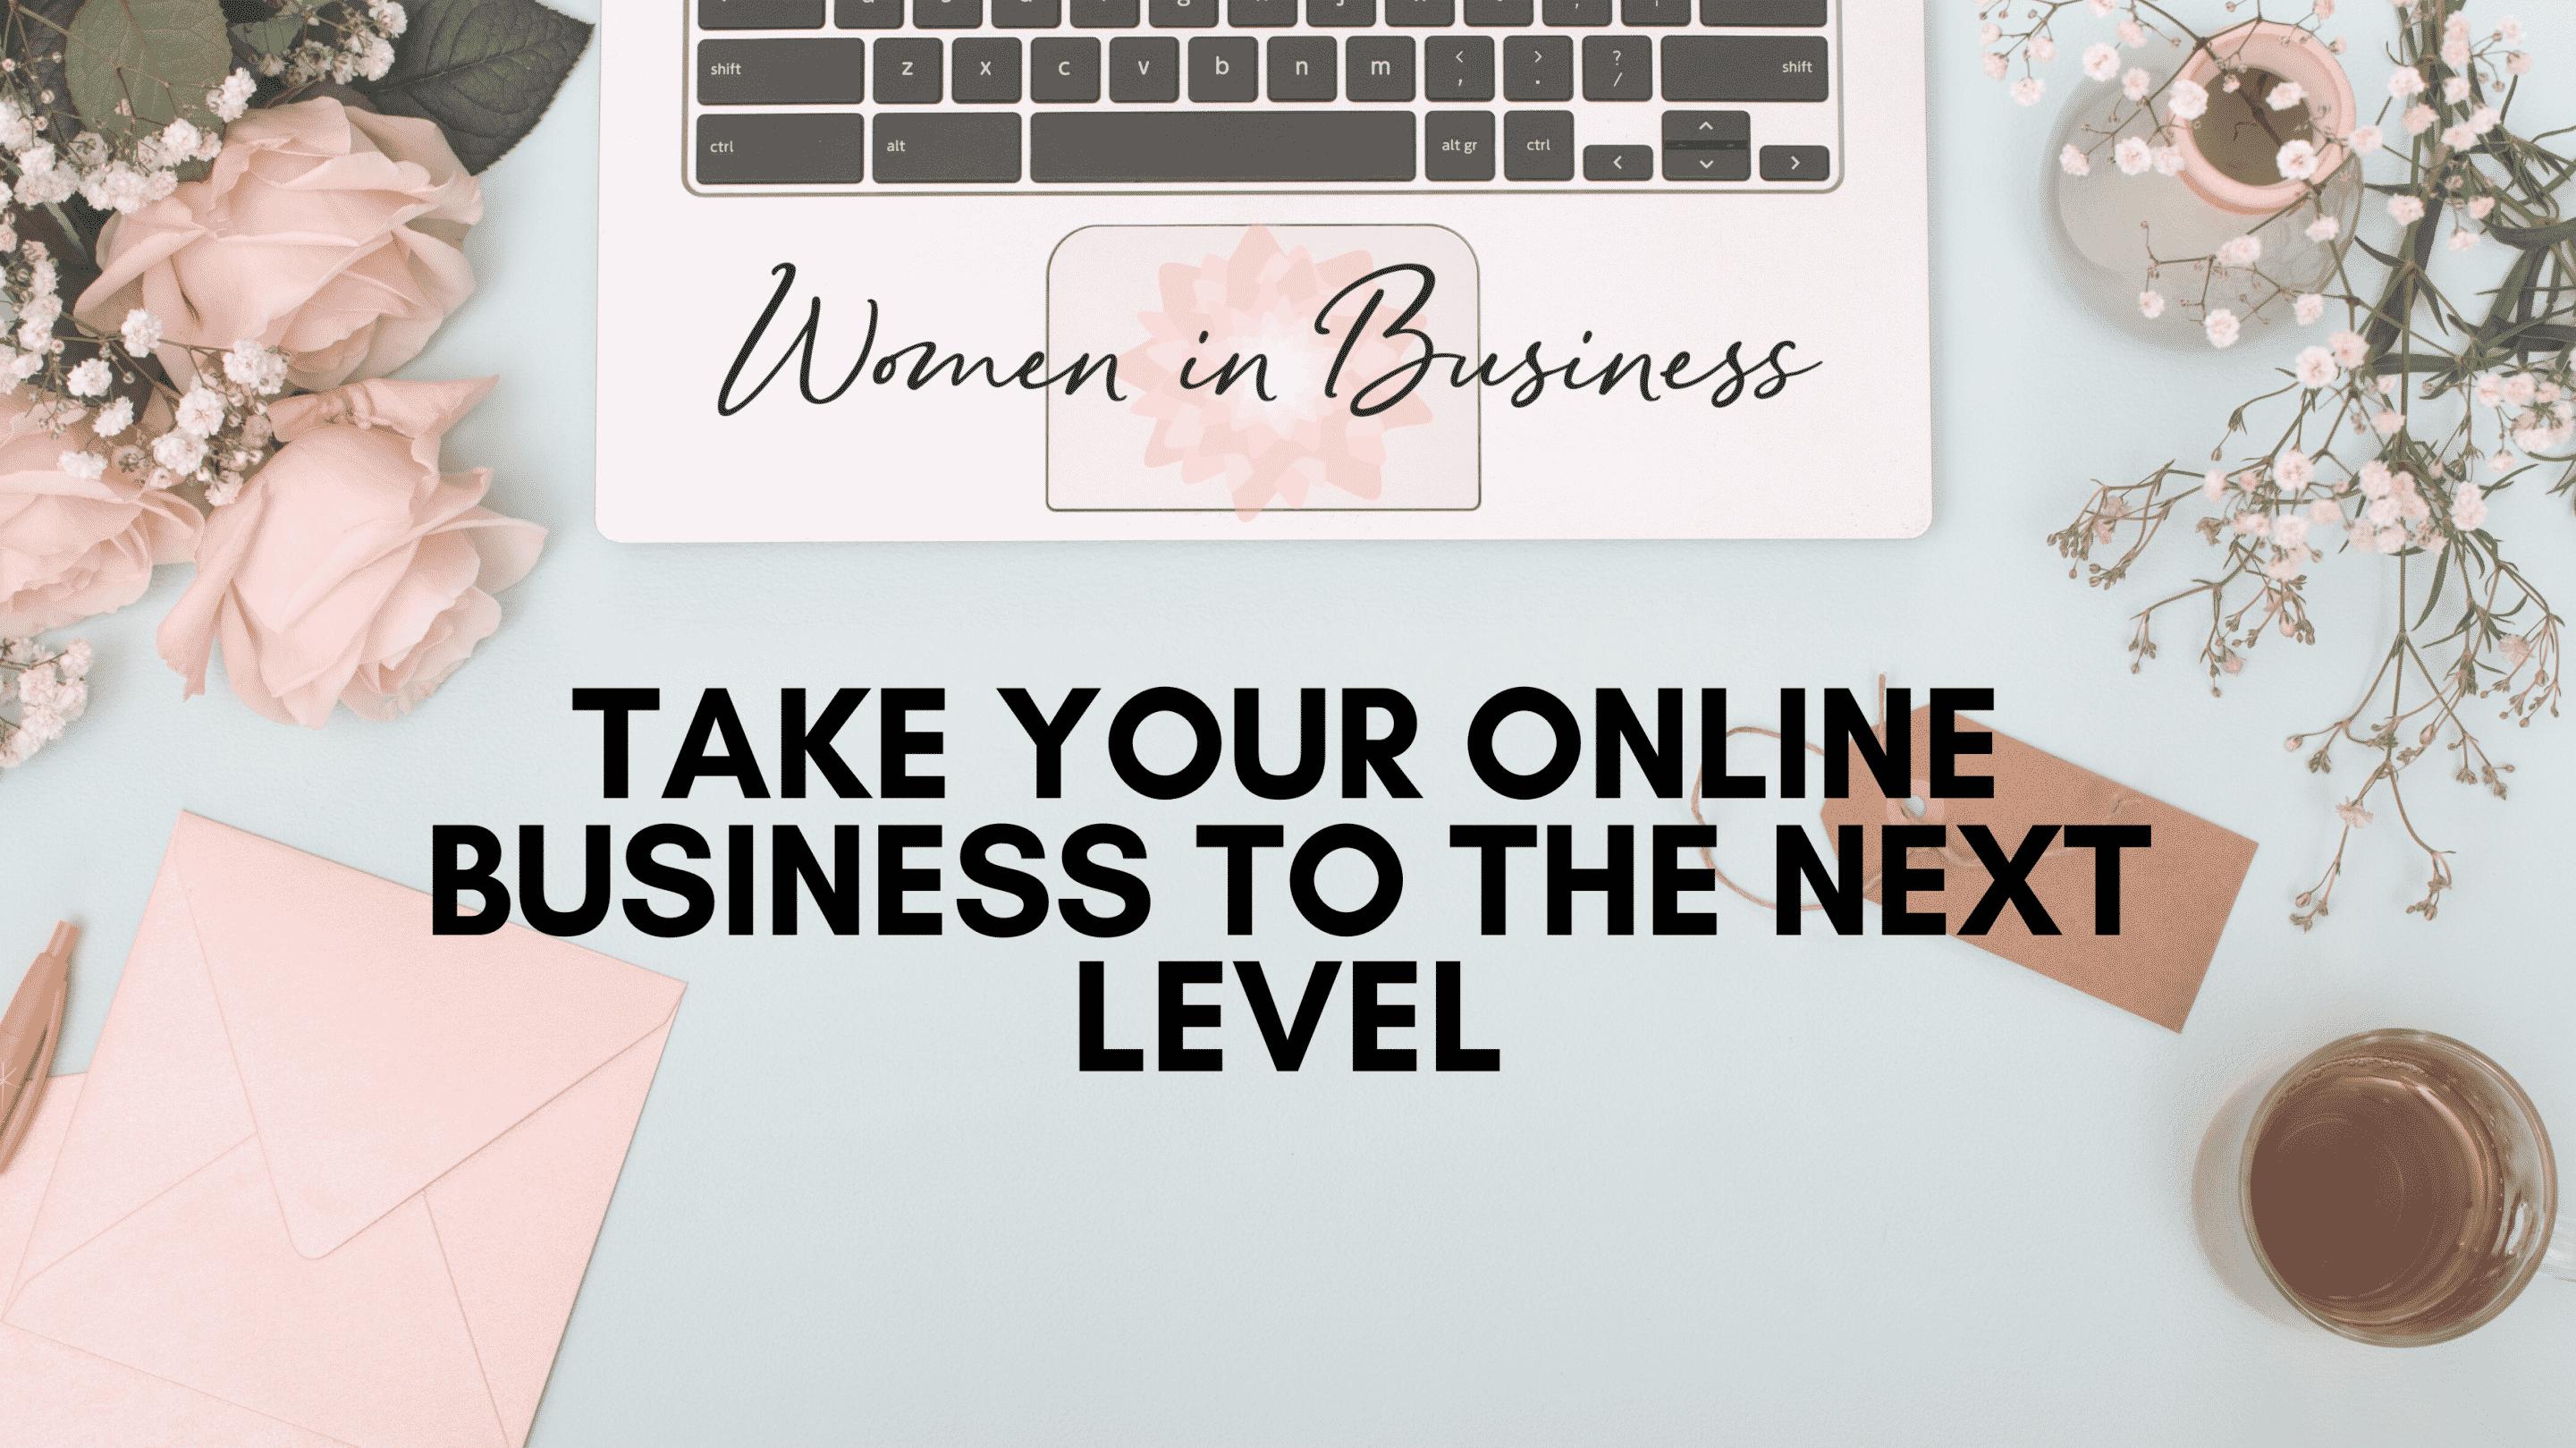 online business opportunities for women